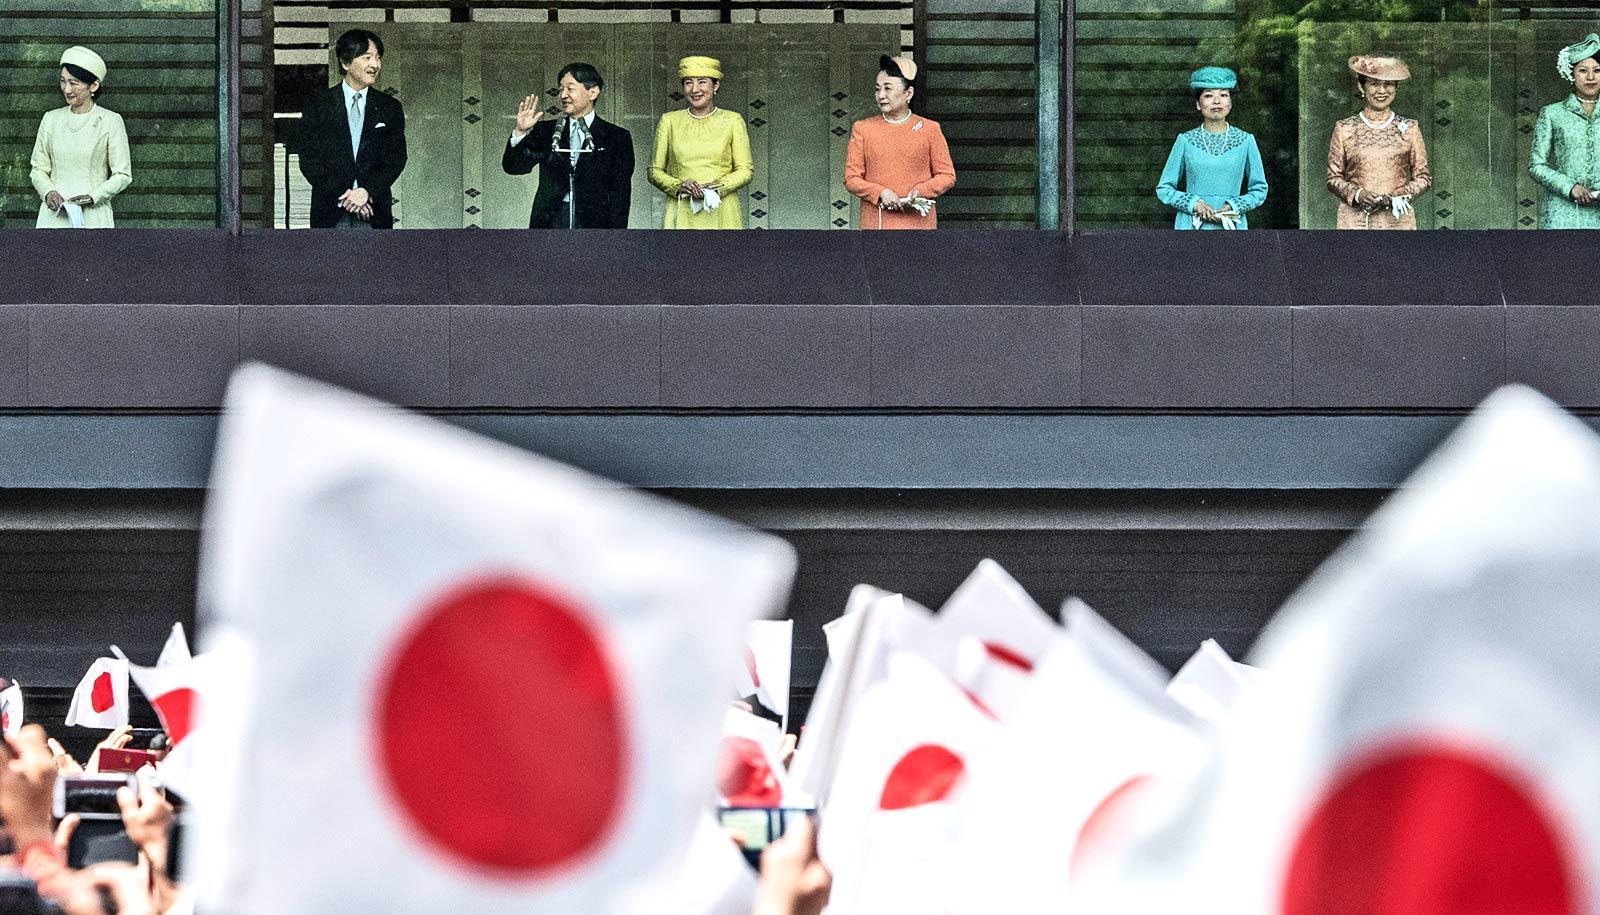 Emperor Naruhito and the Japanese royal family